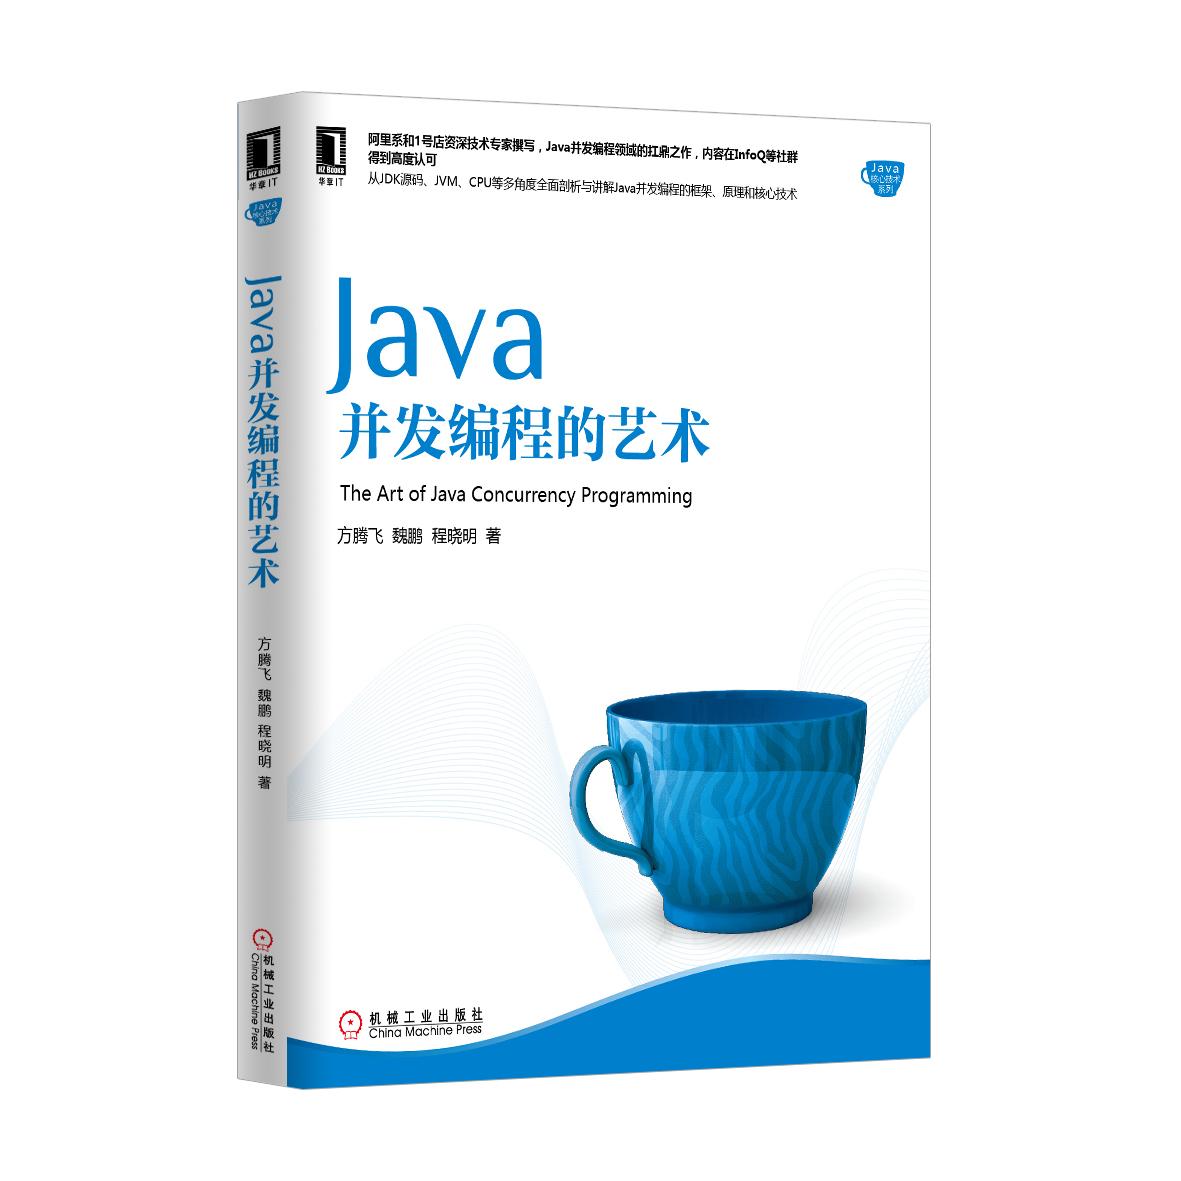 Java并发编程的艺术-立.jpg